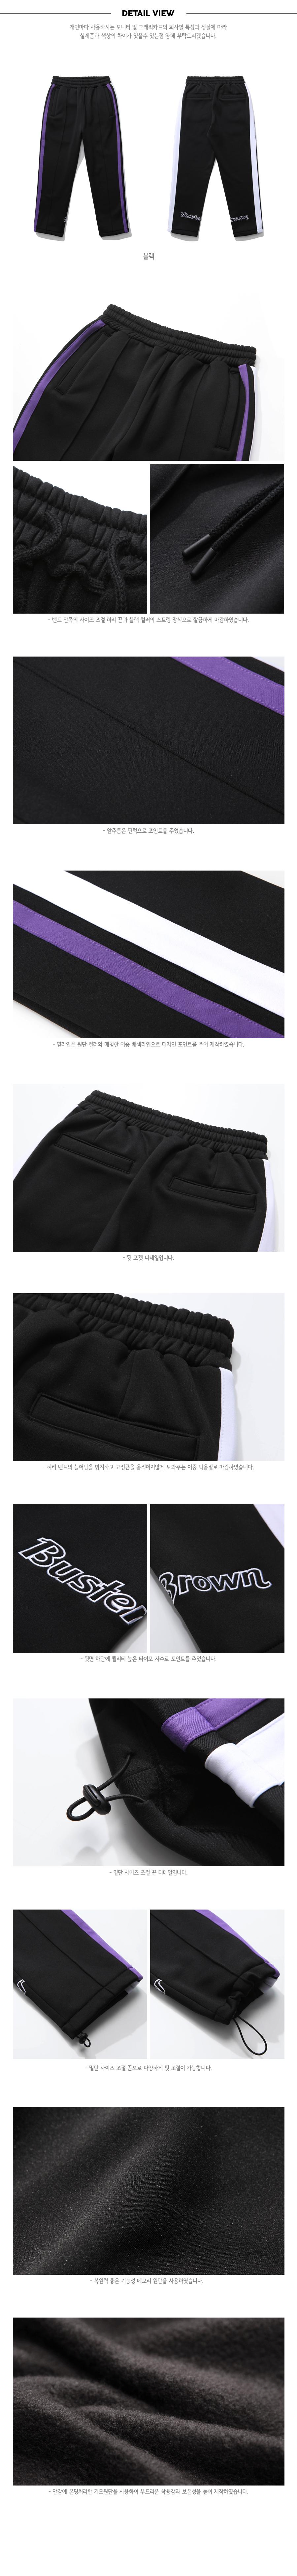 20181011_line_coloration_pants_black_kj.jpg